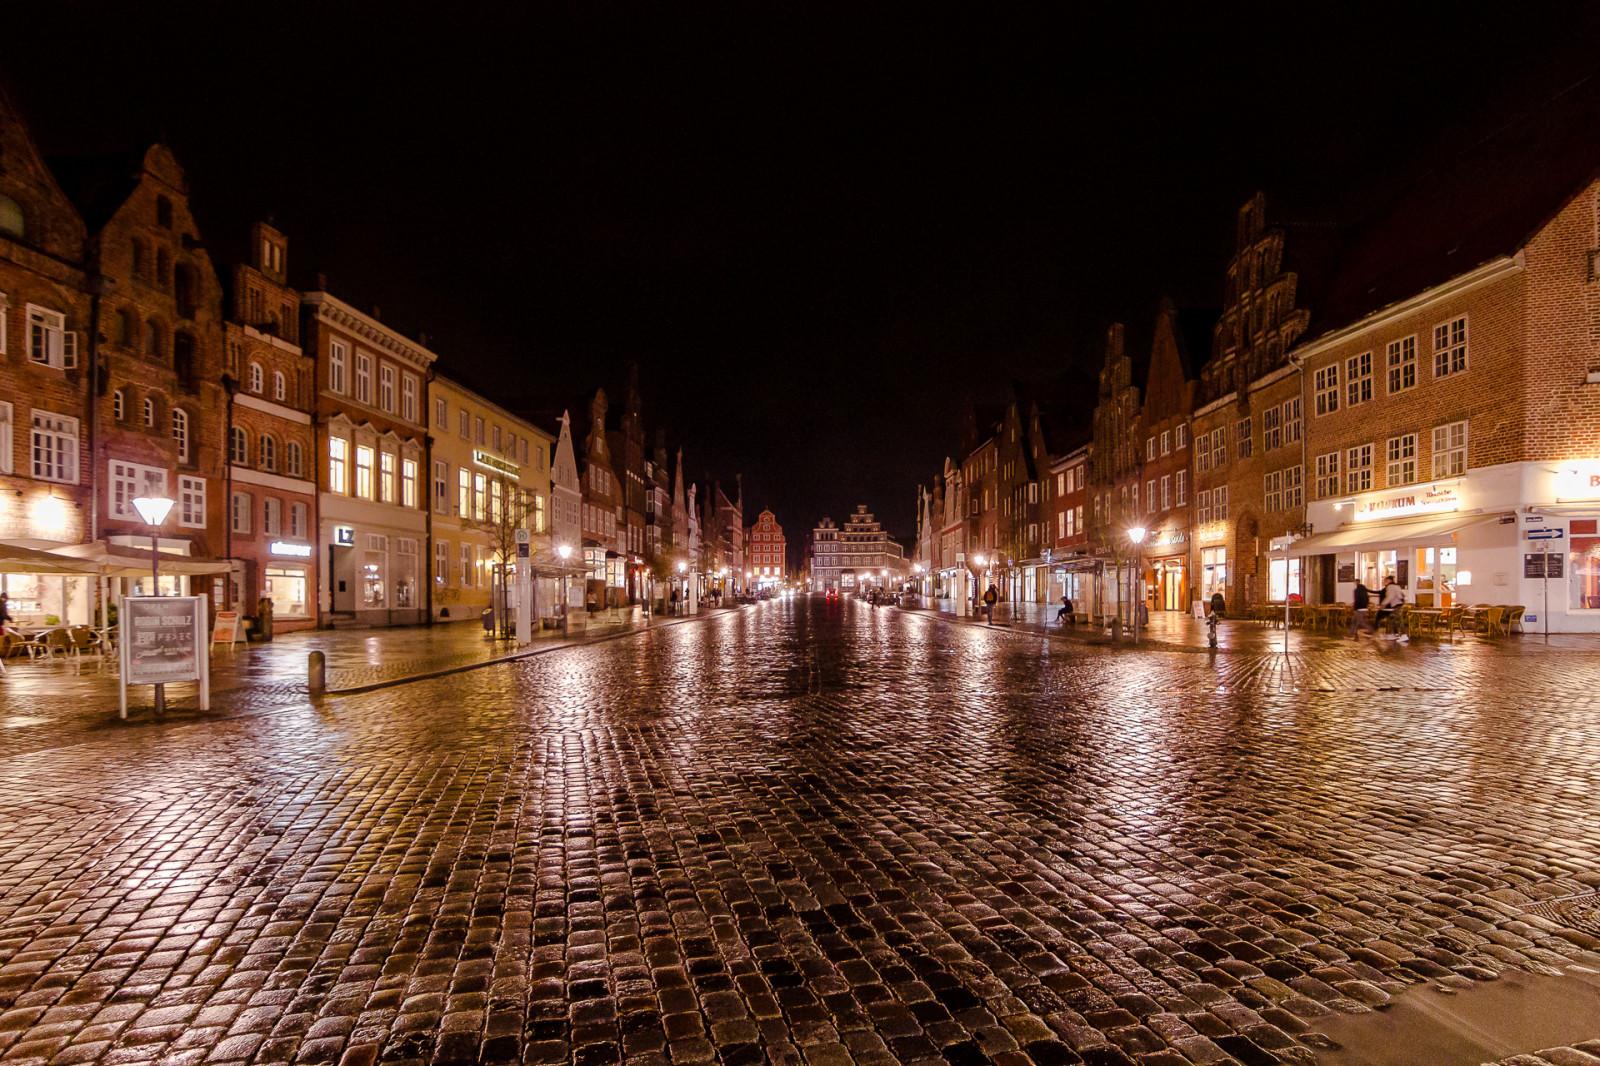 Wallpaper Cityscape Malam Refleksi Langit Hujan Jerman Basah